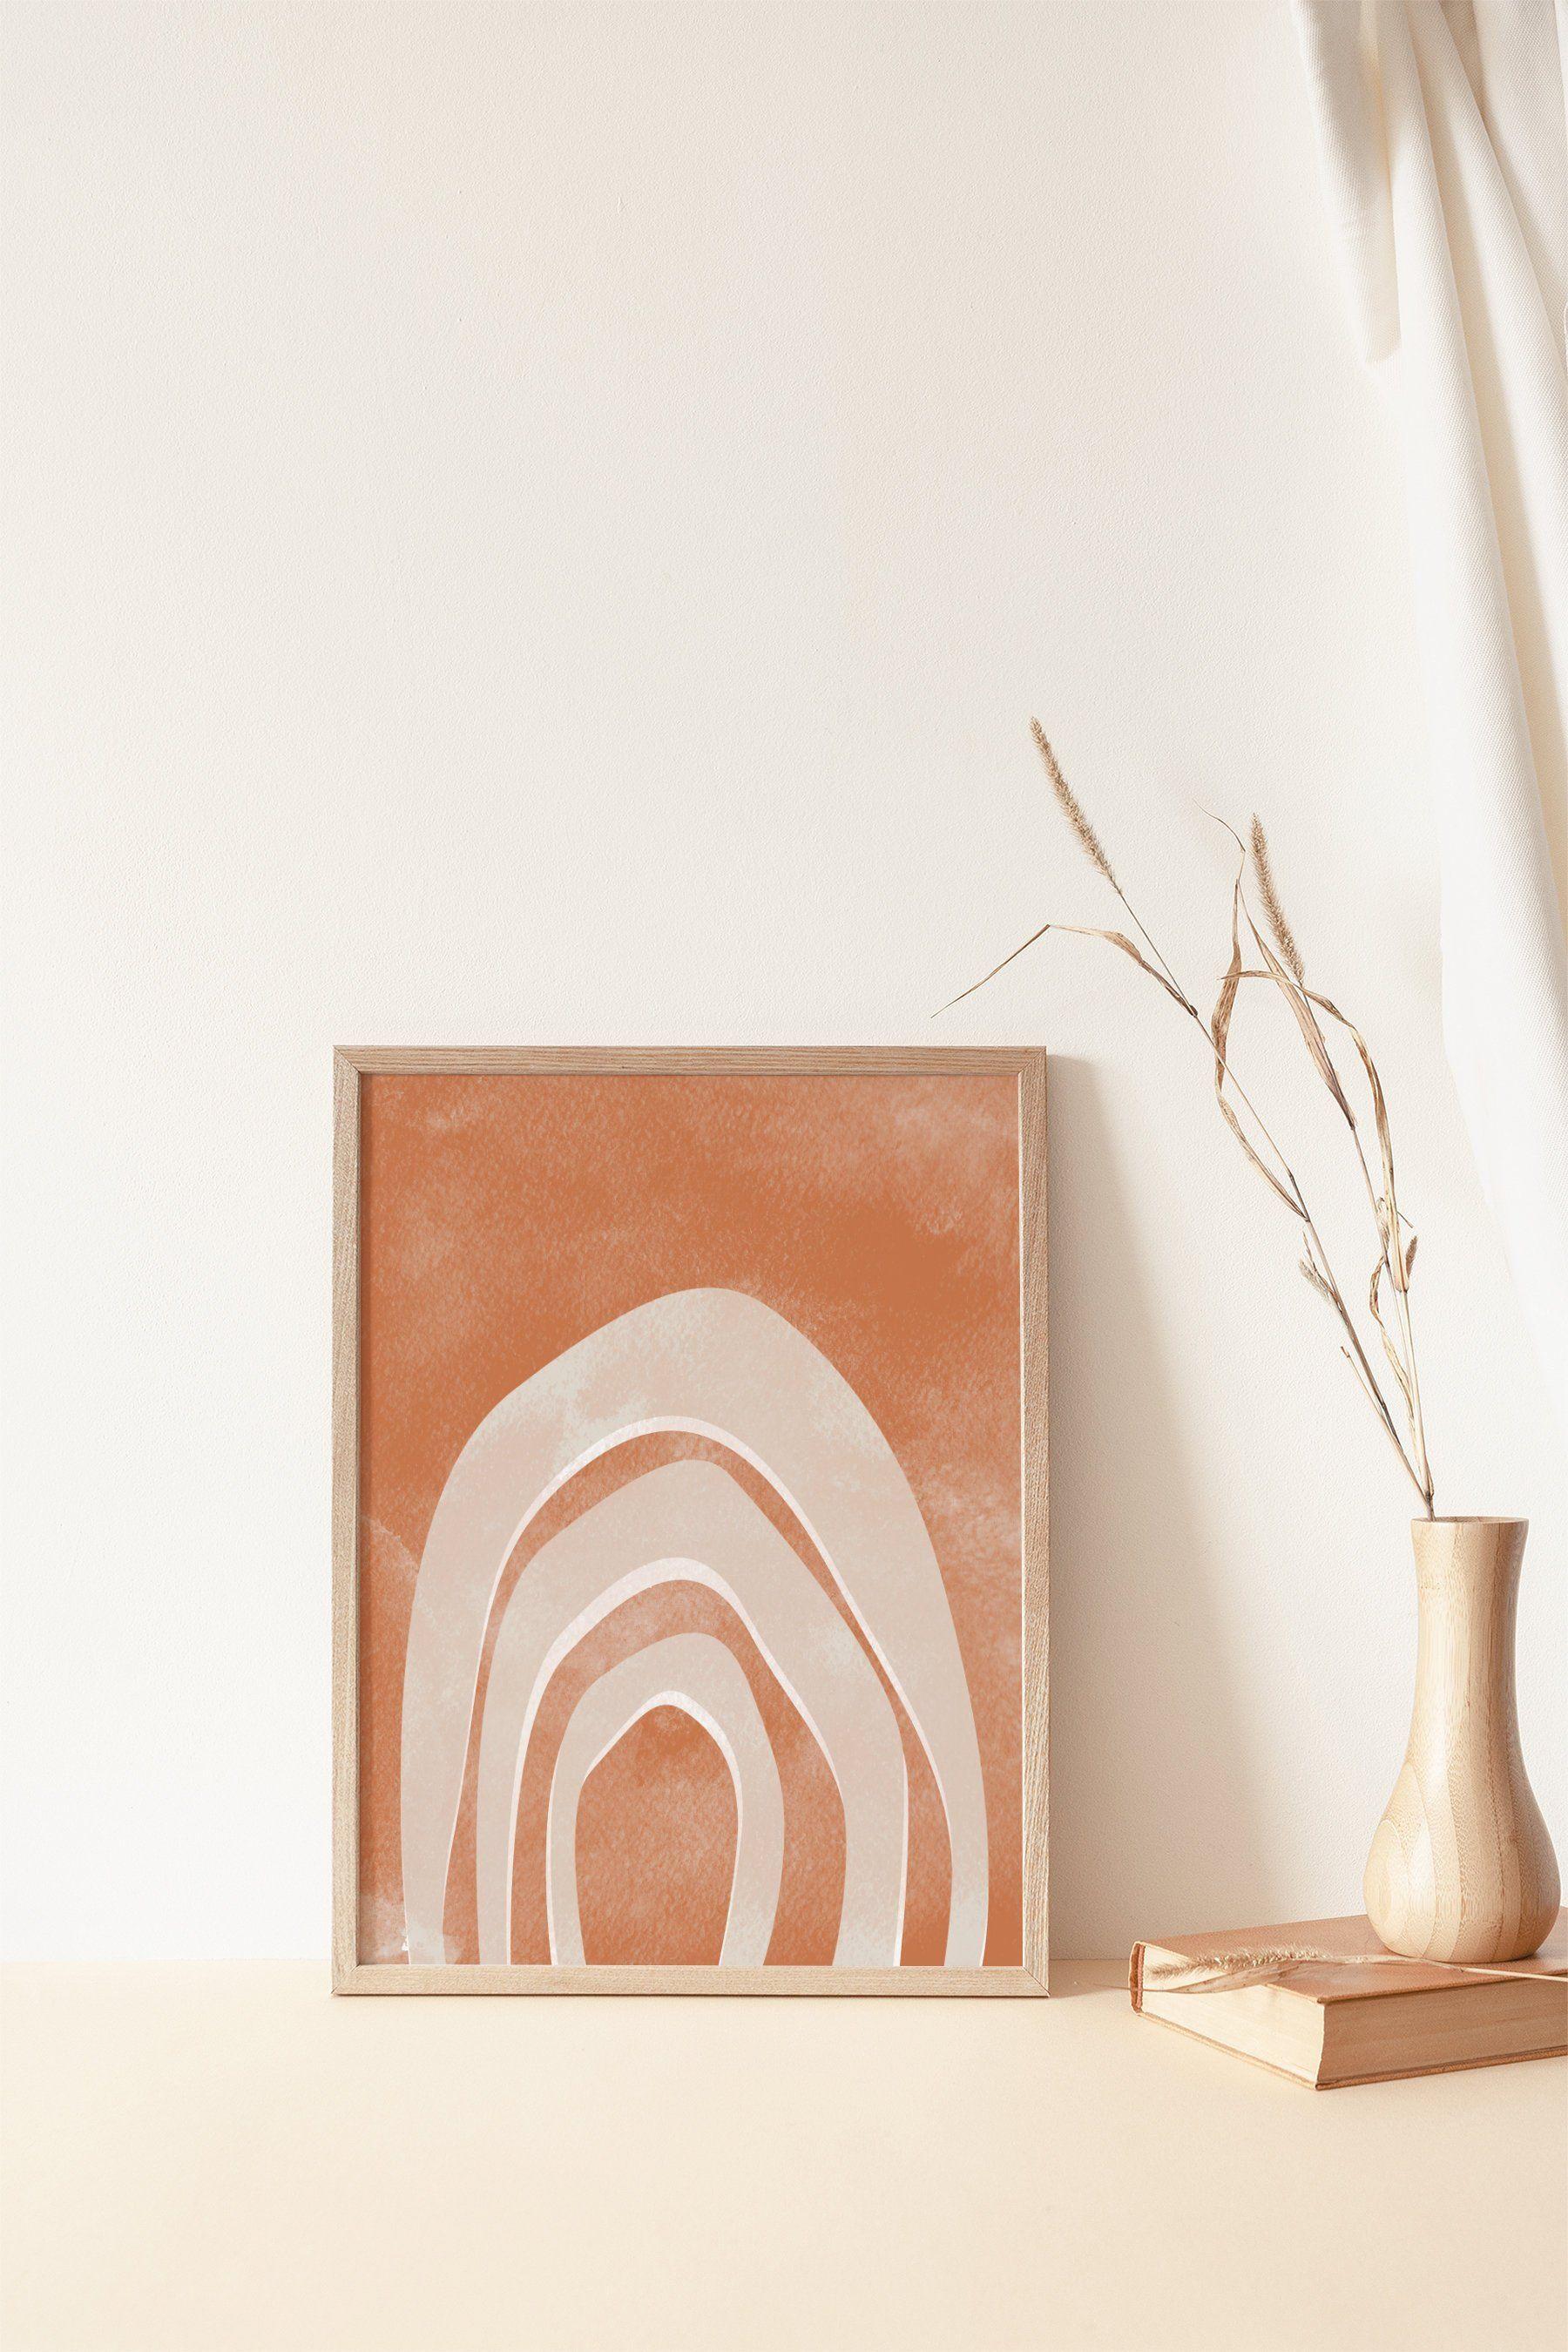 Abstract Rainbow Print Modern Art Neutral Decor Terracotta Rust Orange Prints Abstract Wall Art Digita Rainbow Abstract Abstract Wall Art Neutral Wall Art